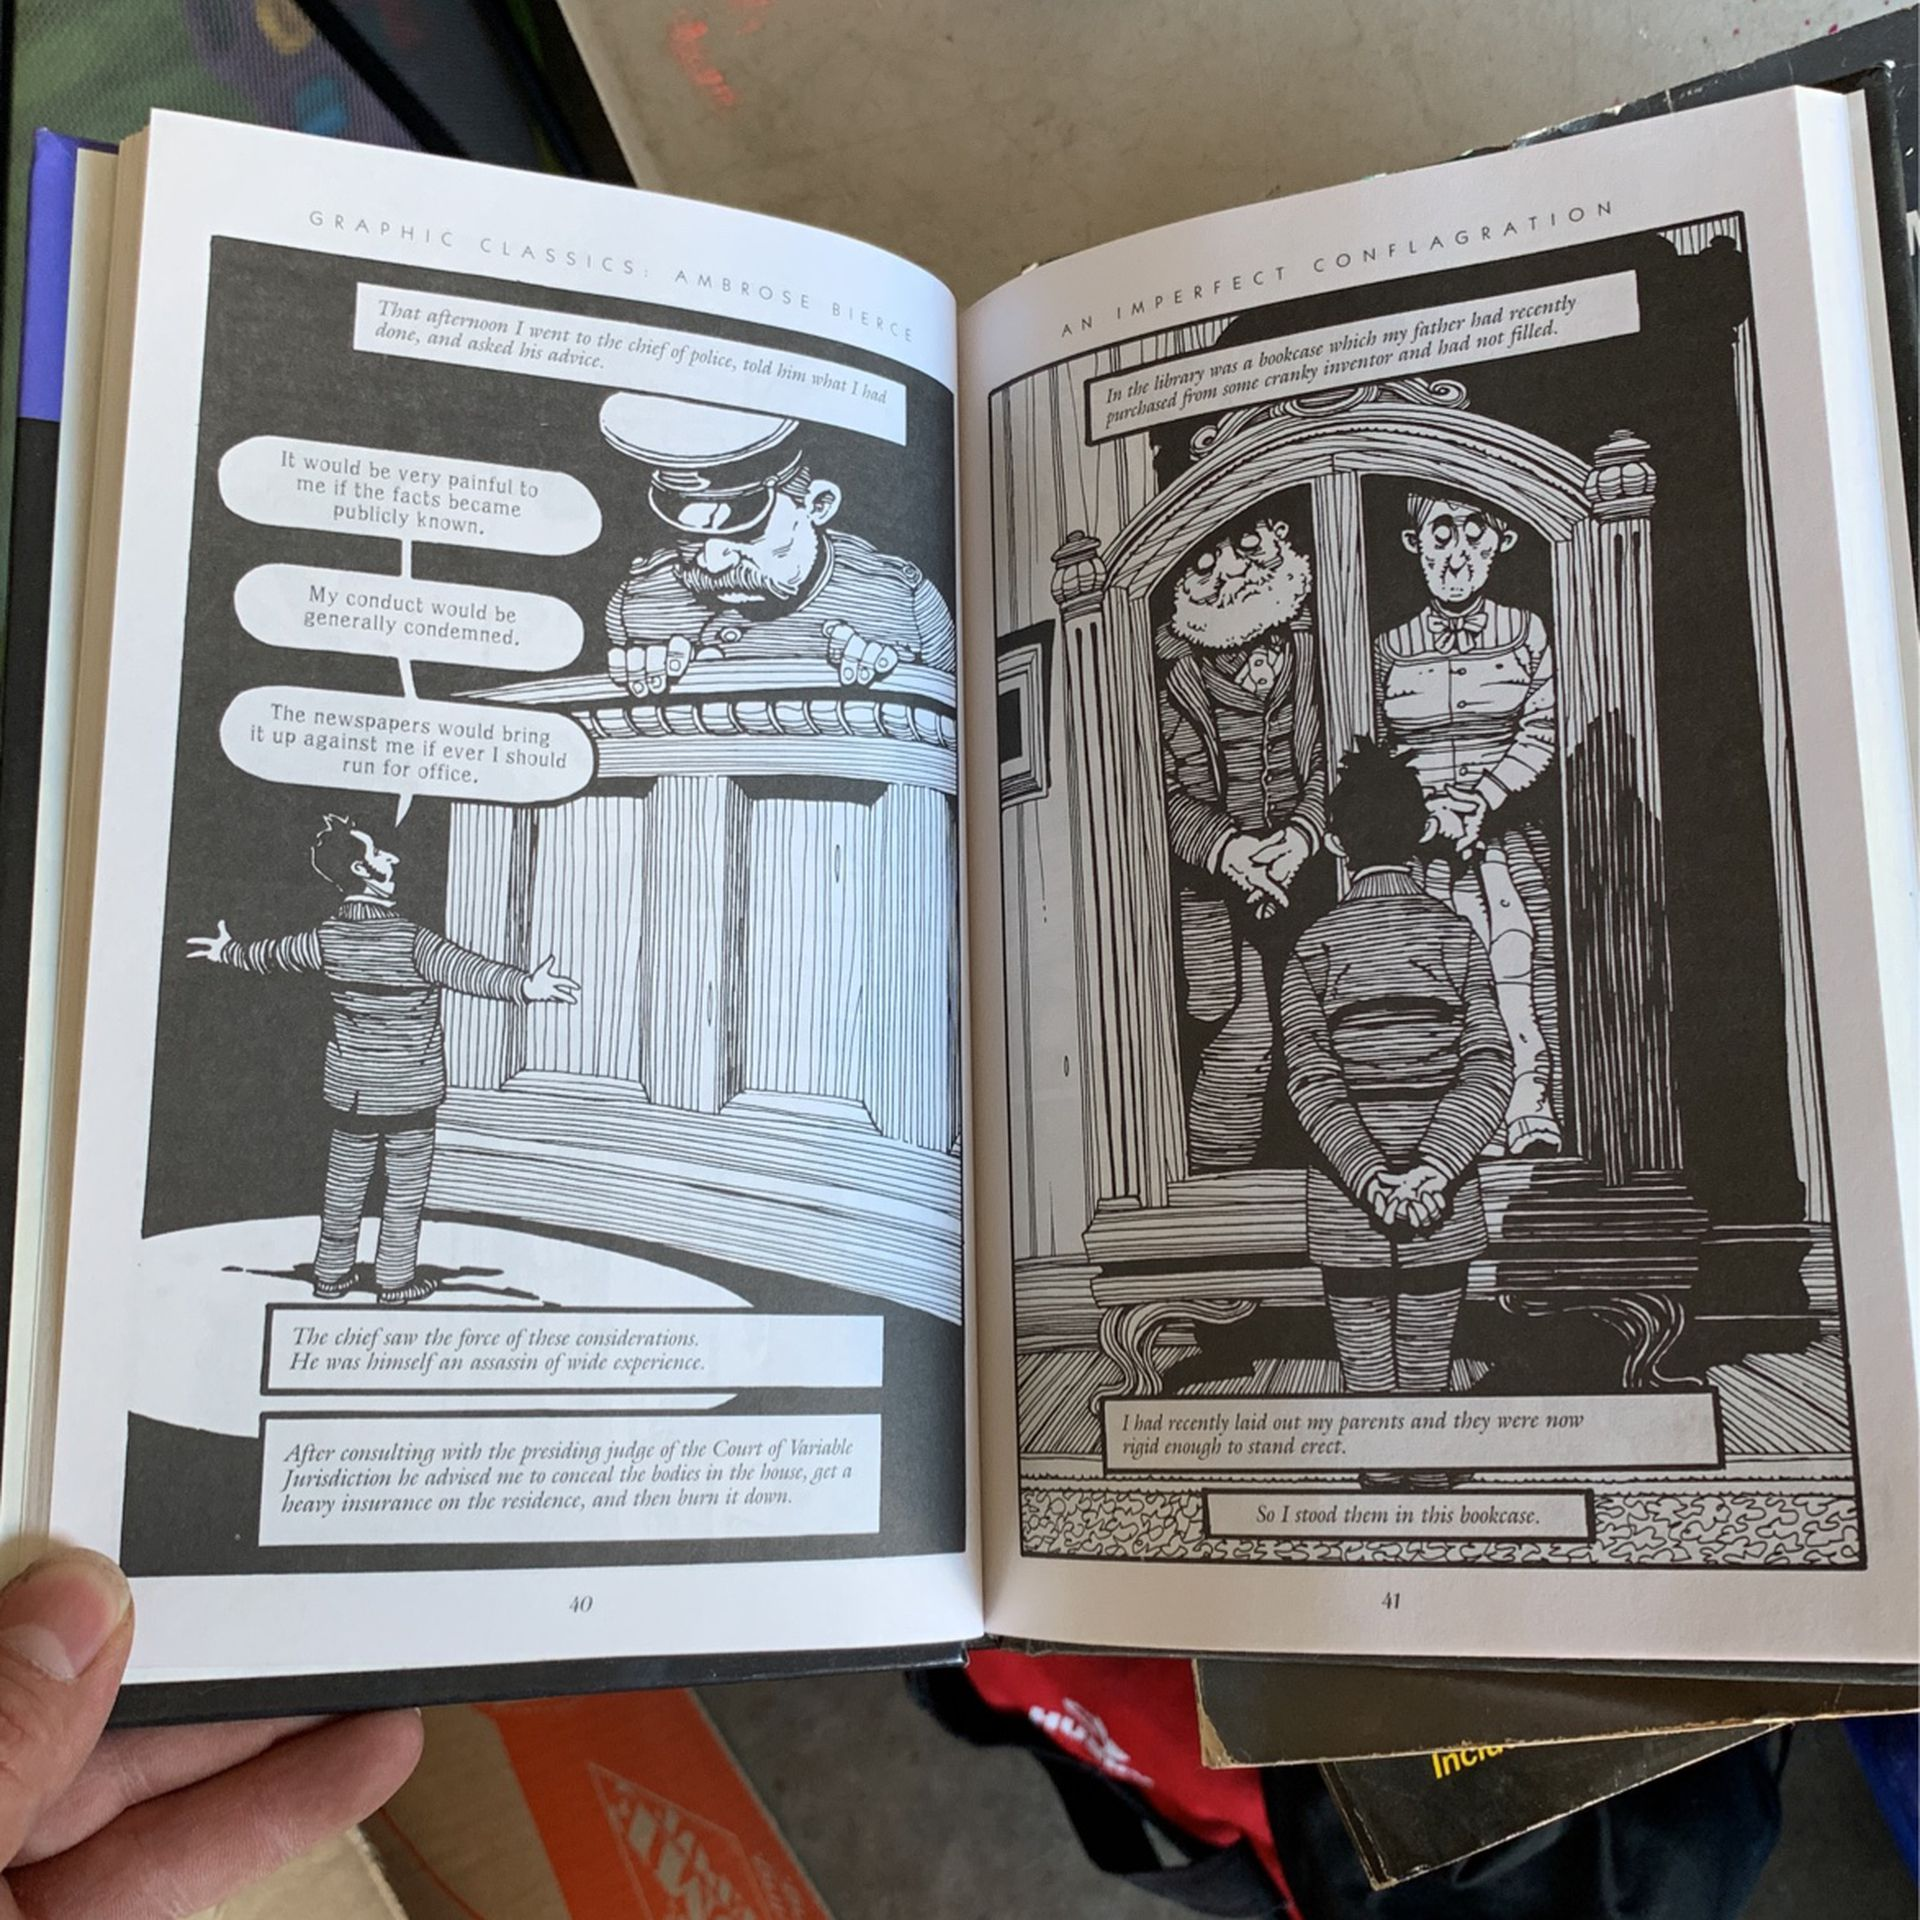 Graphic Classics Book